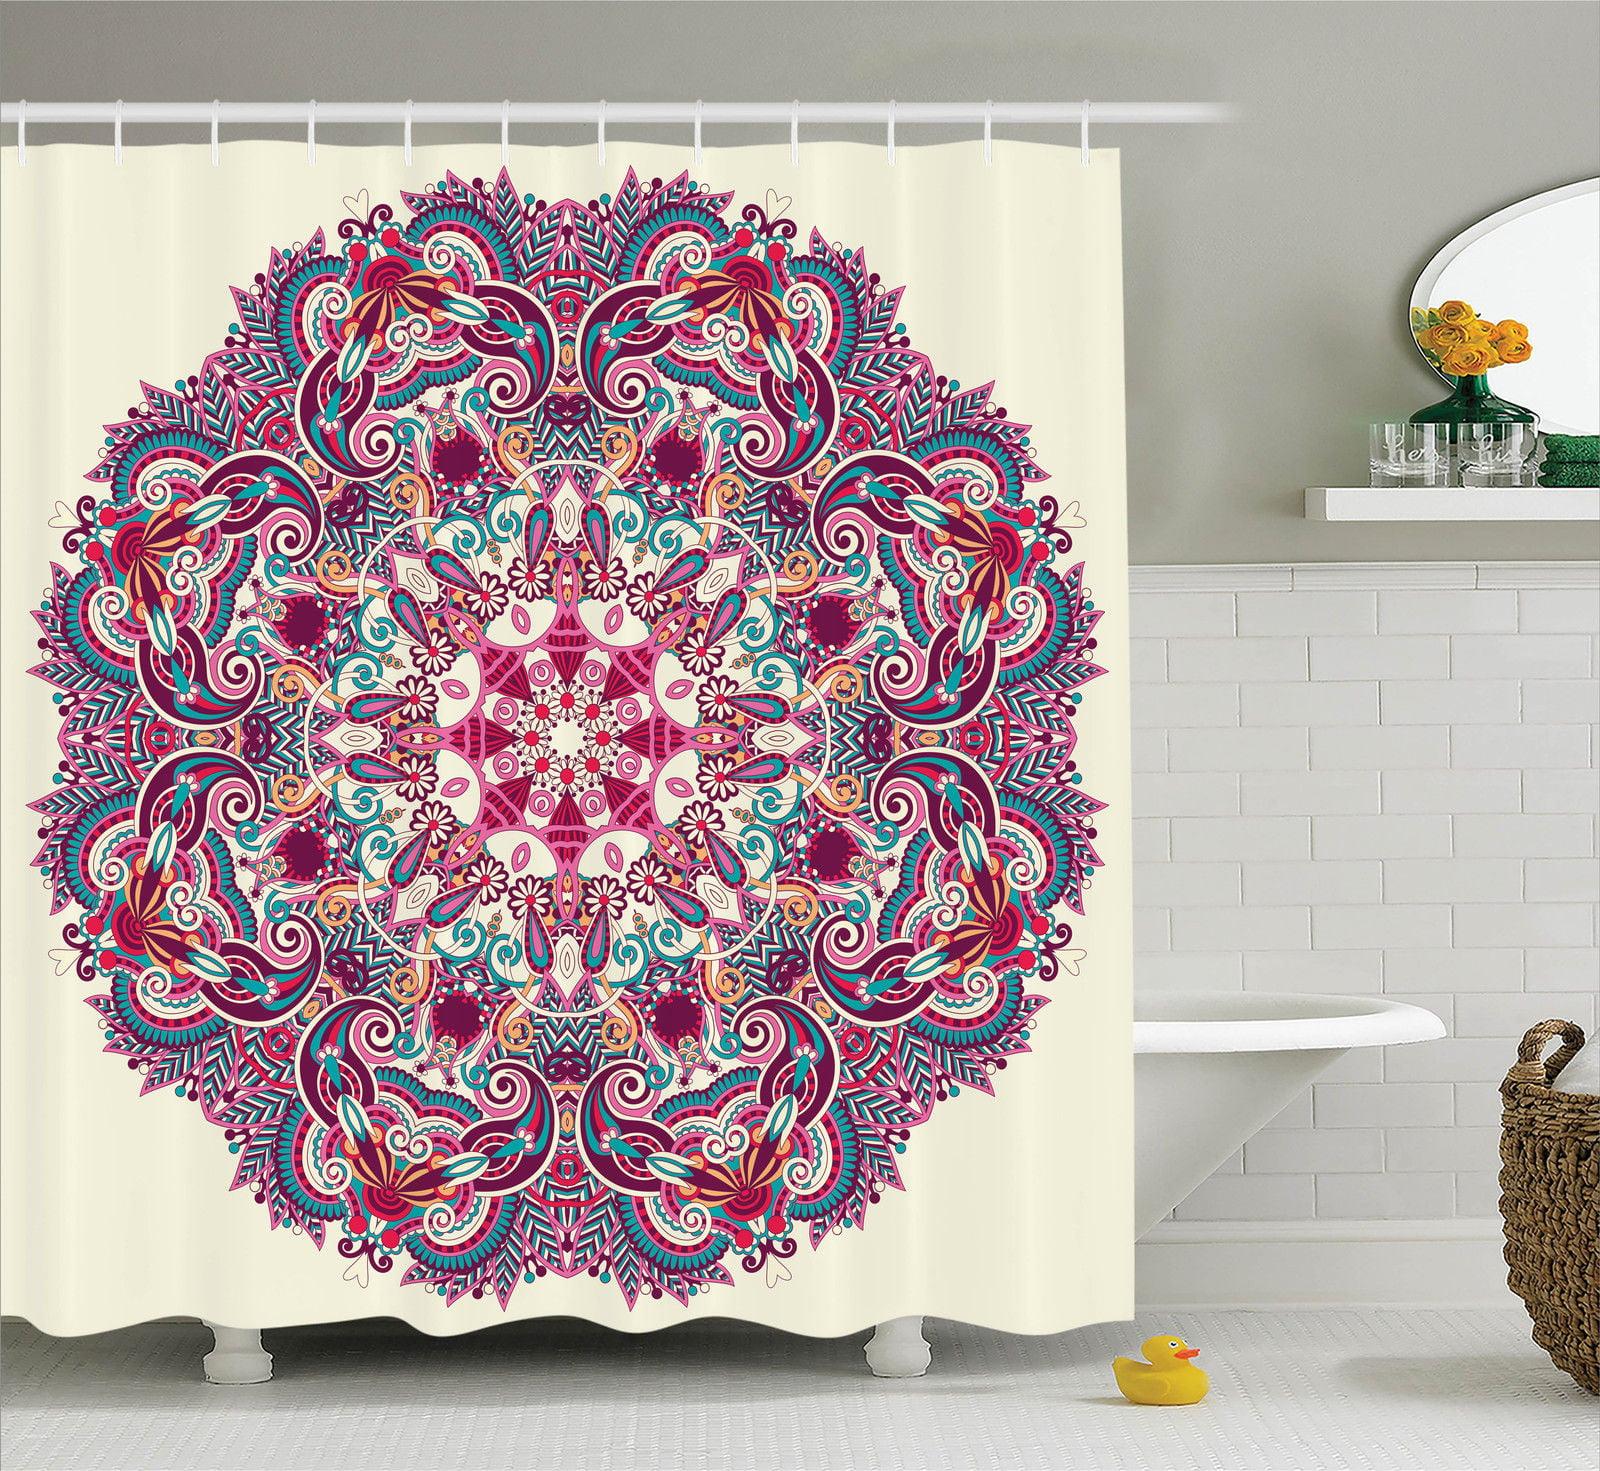 Mandala Decor  Detailed Mandala Pattern With Flower And L...